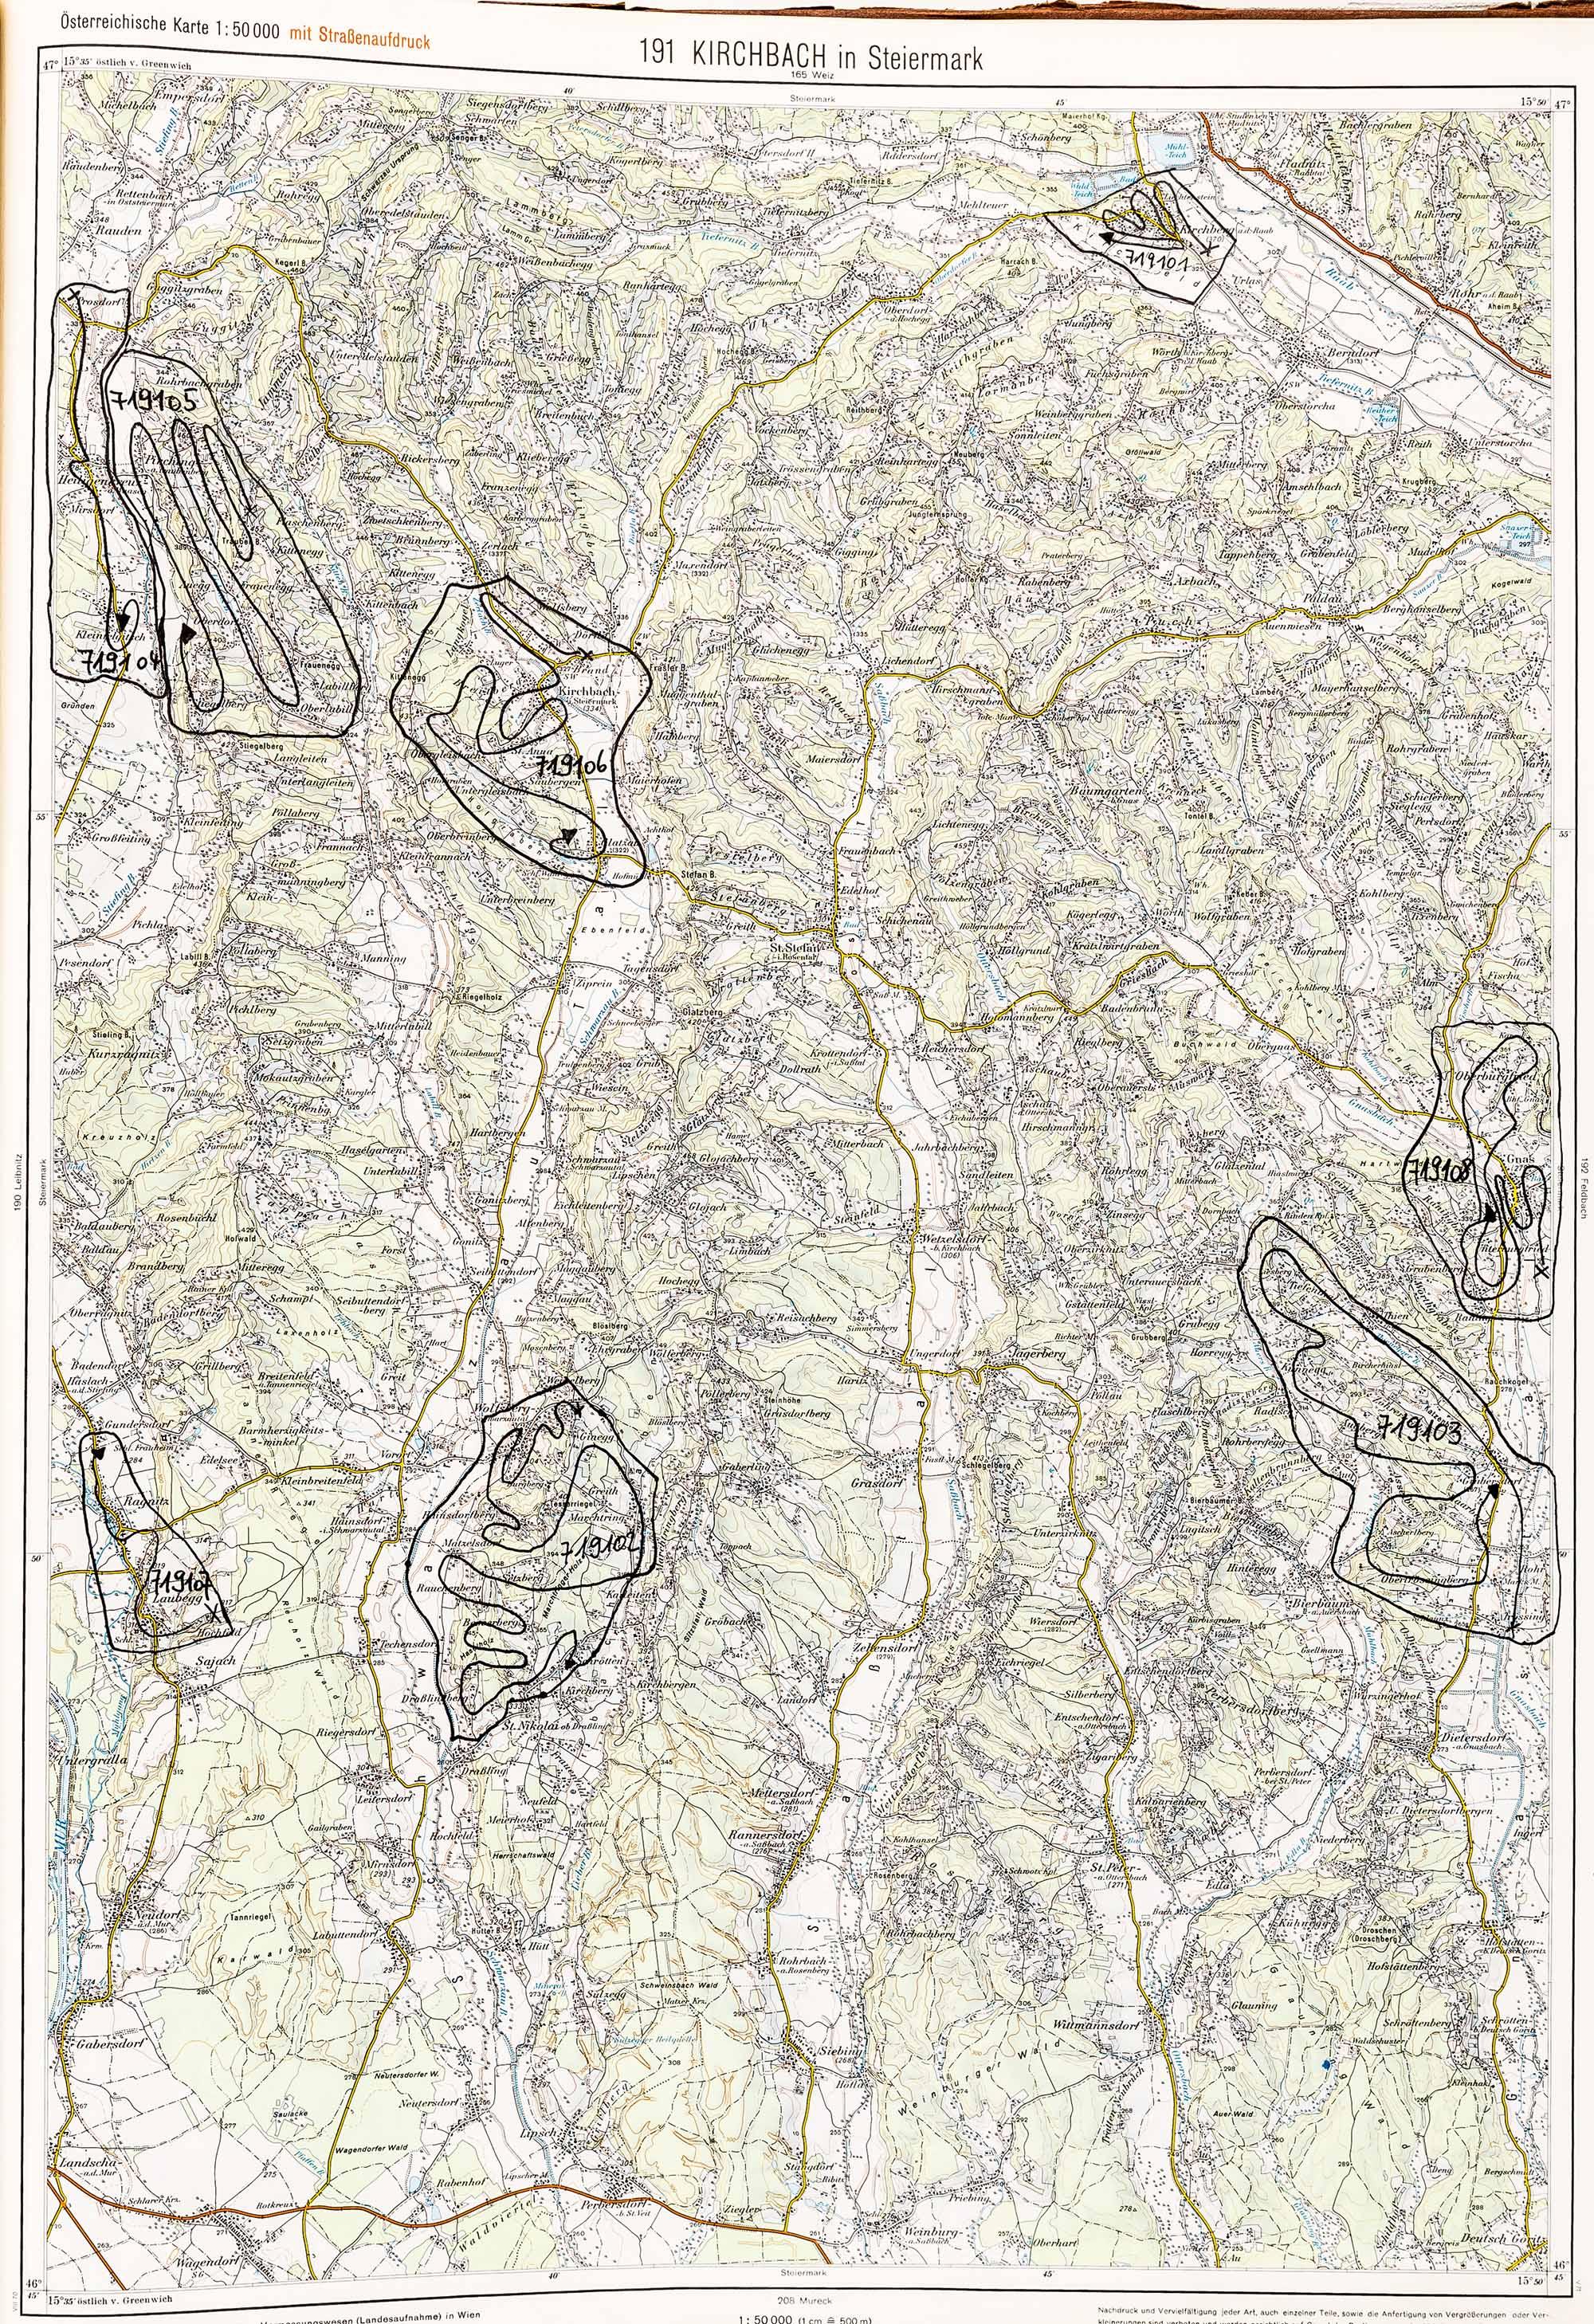 1975-1979 Karte 191